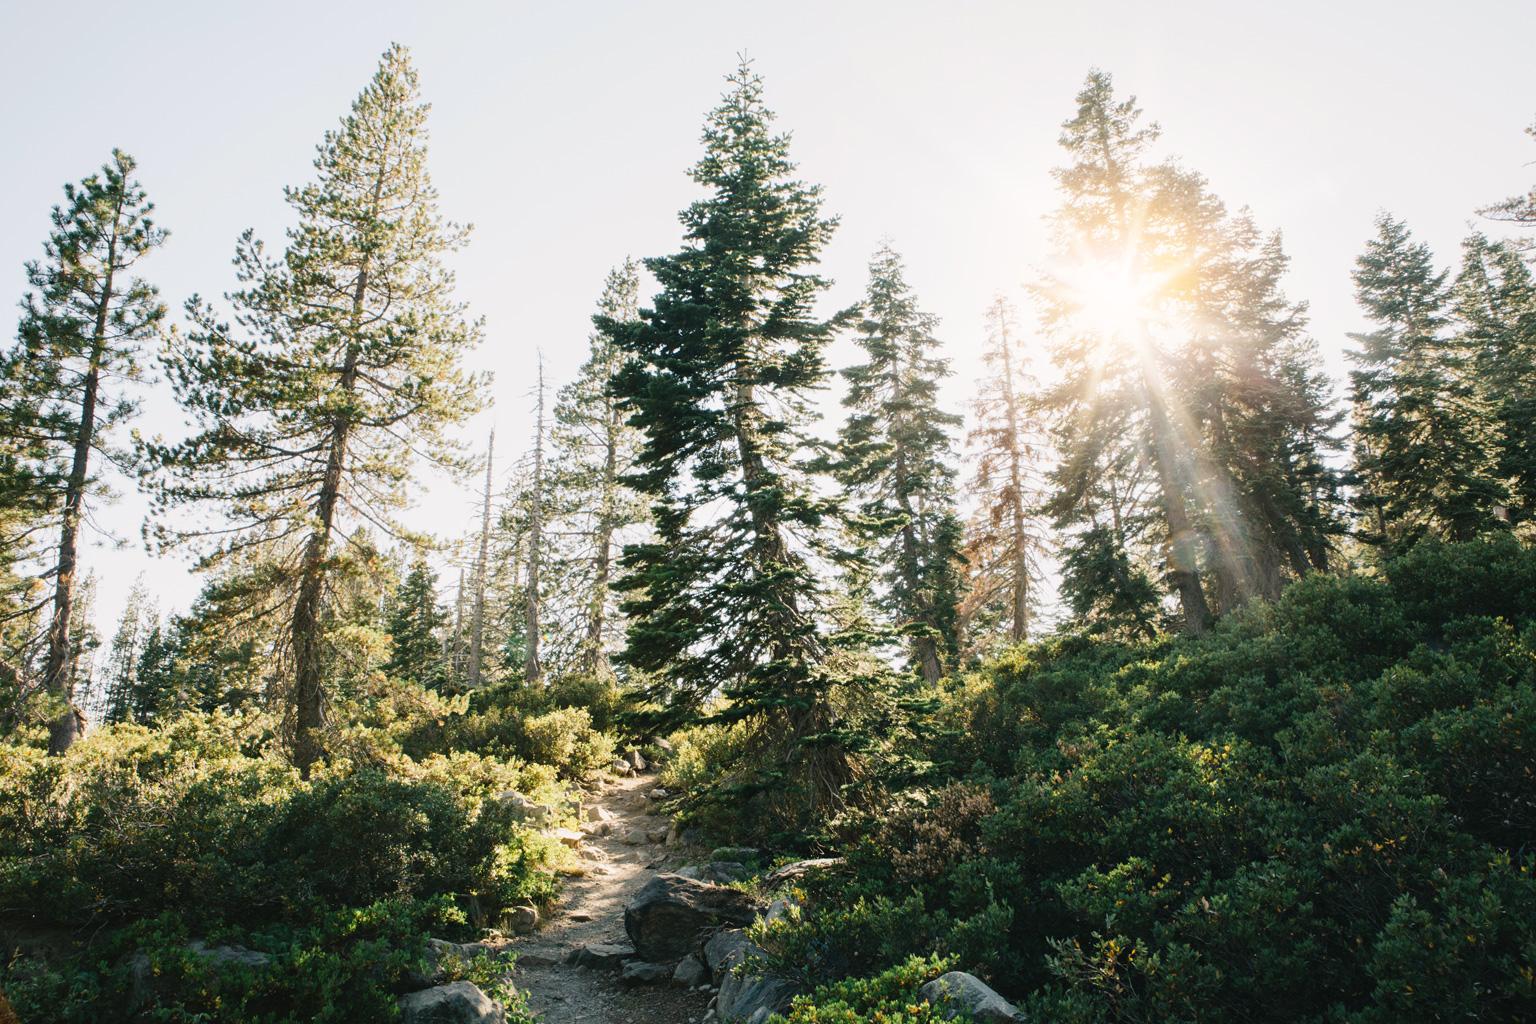 CindyGiovagnoli_outdoors_photographer_Sierra_Buttes_firetower_watchtower_Sardine_Snag_Bear_lake_hike_swim_camp-068.jpg